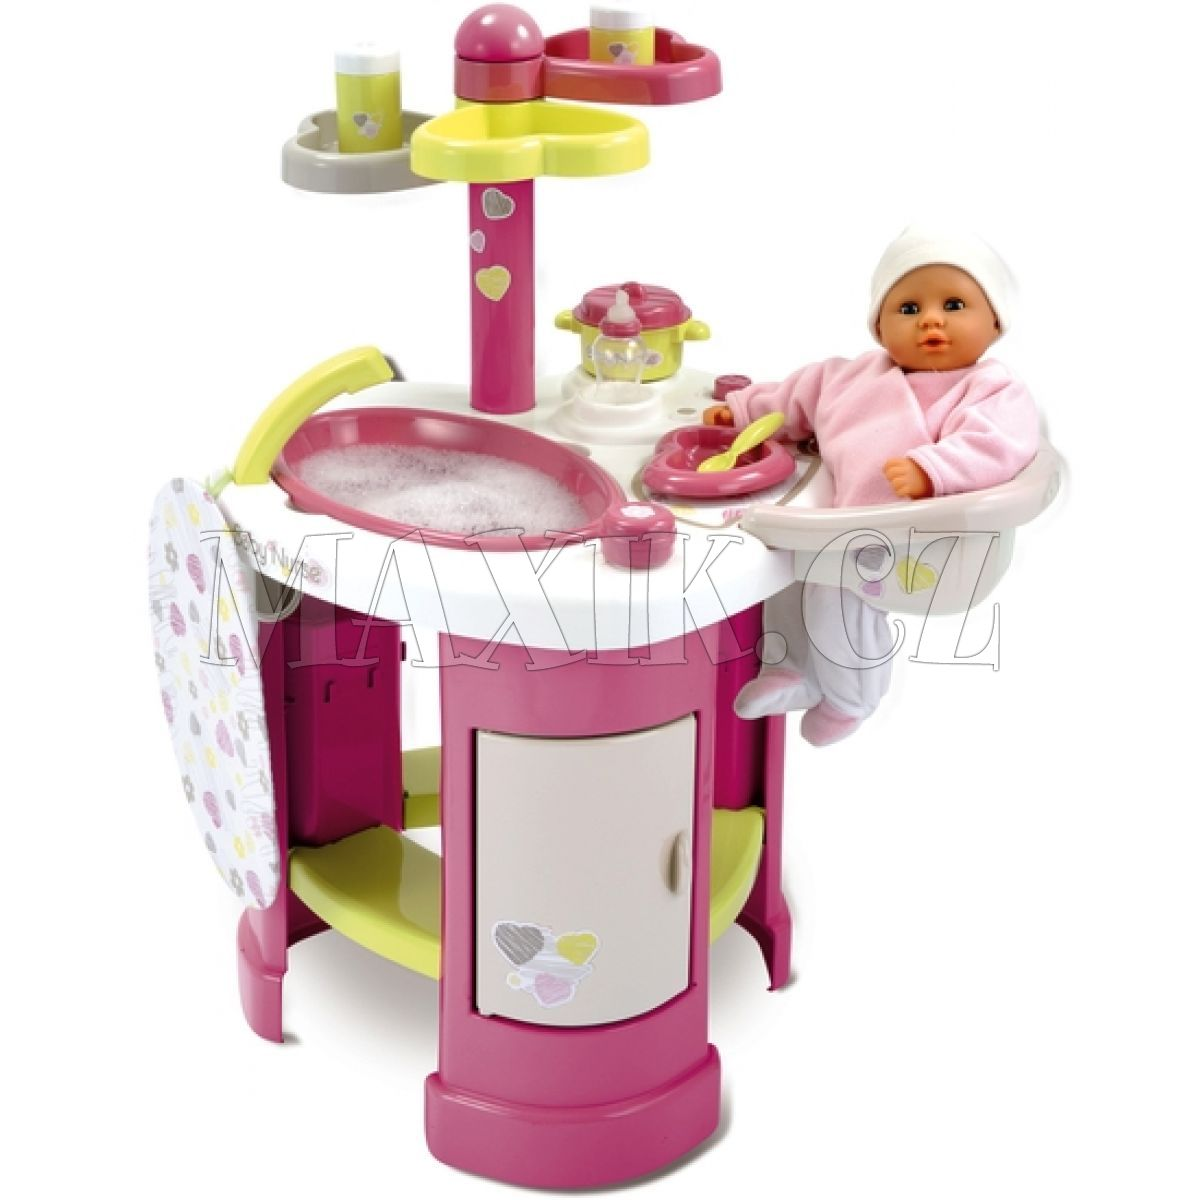 j deln a koupac pult pro panenky baby nurse smoby. Black Bedroom Furniture Sets. Home Design Ideas